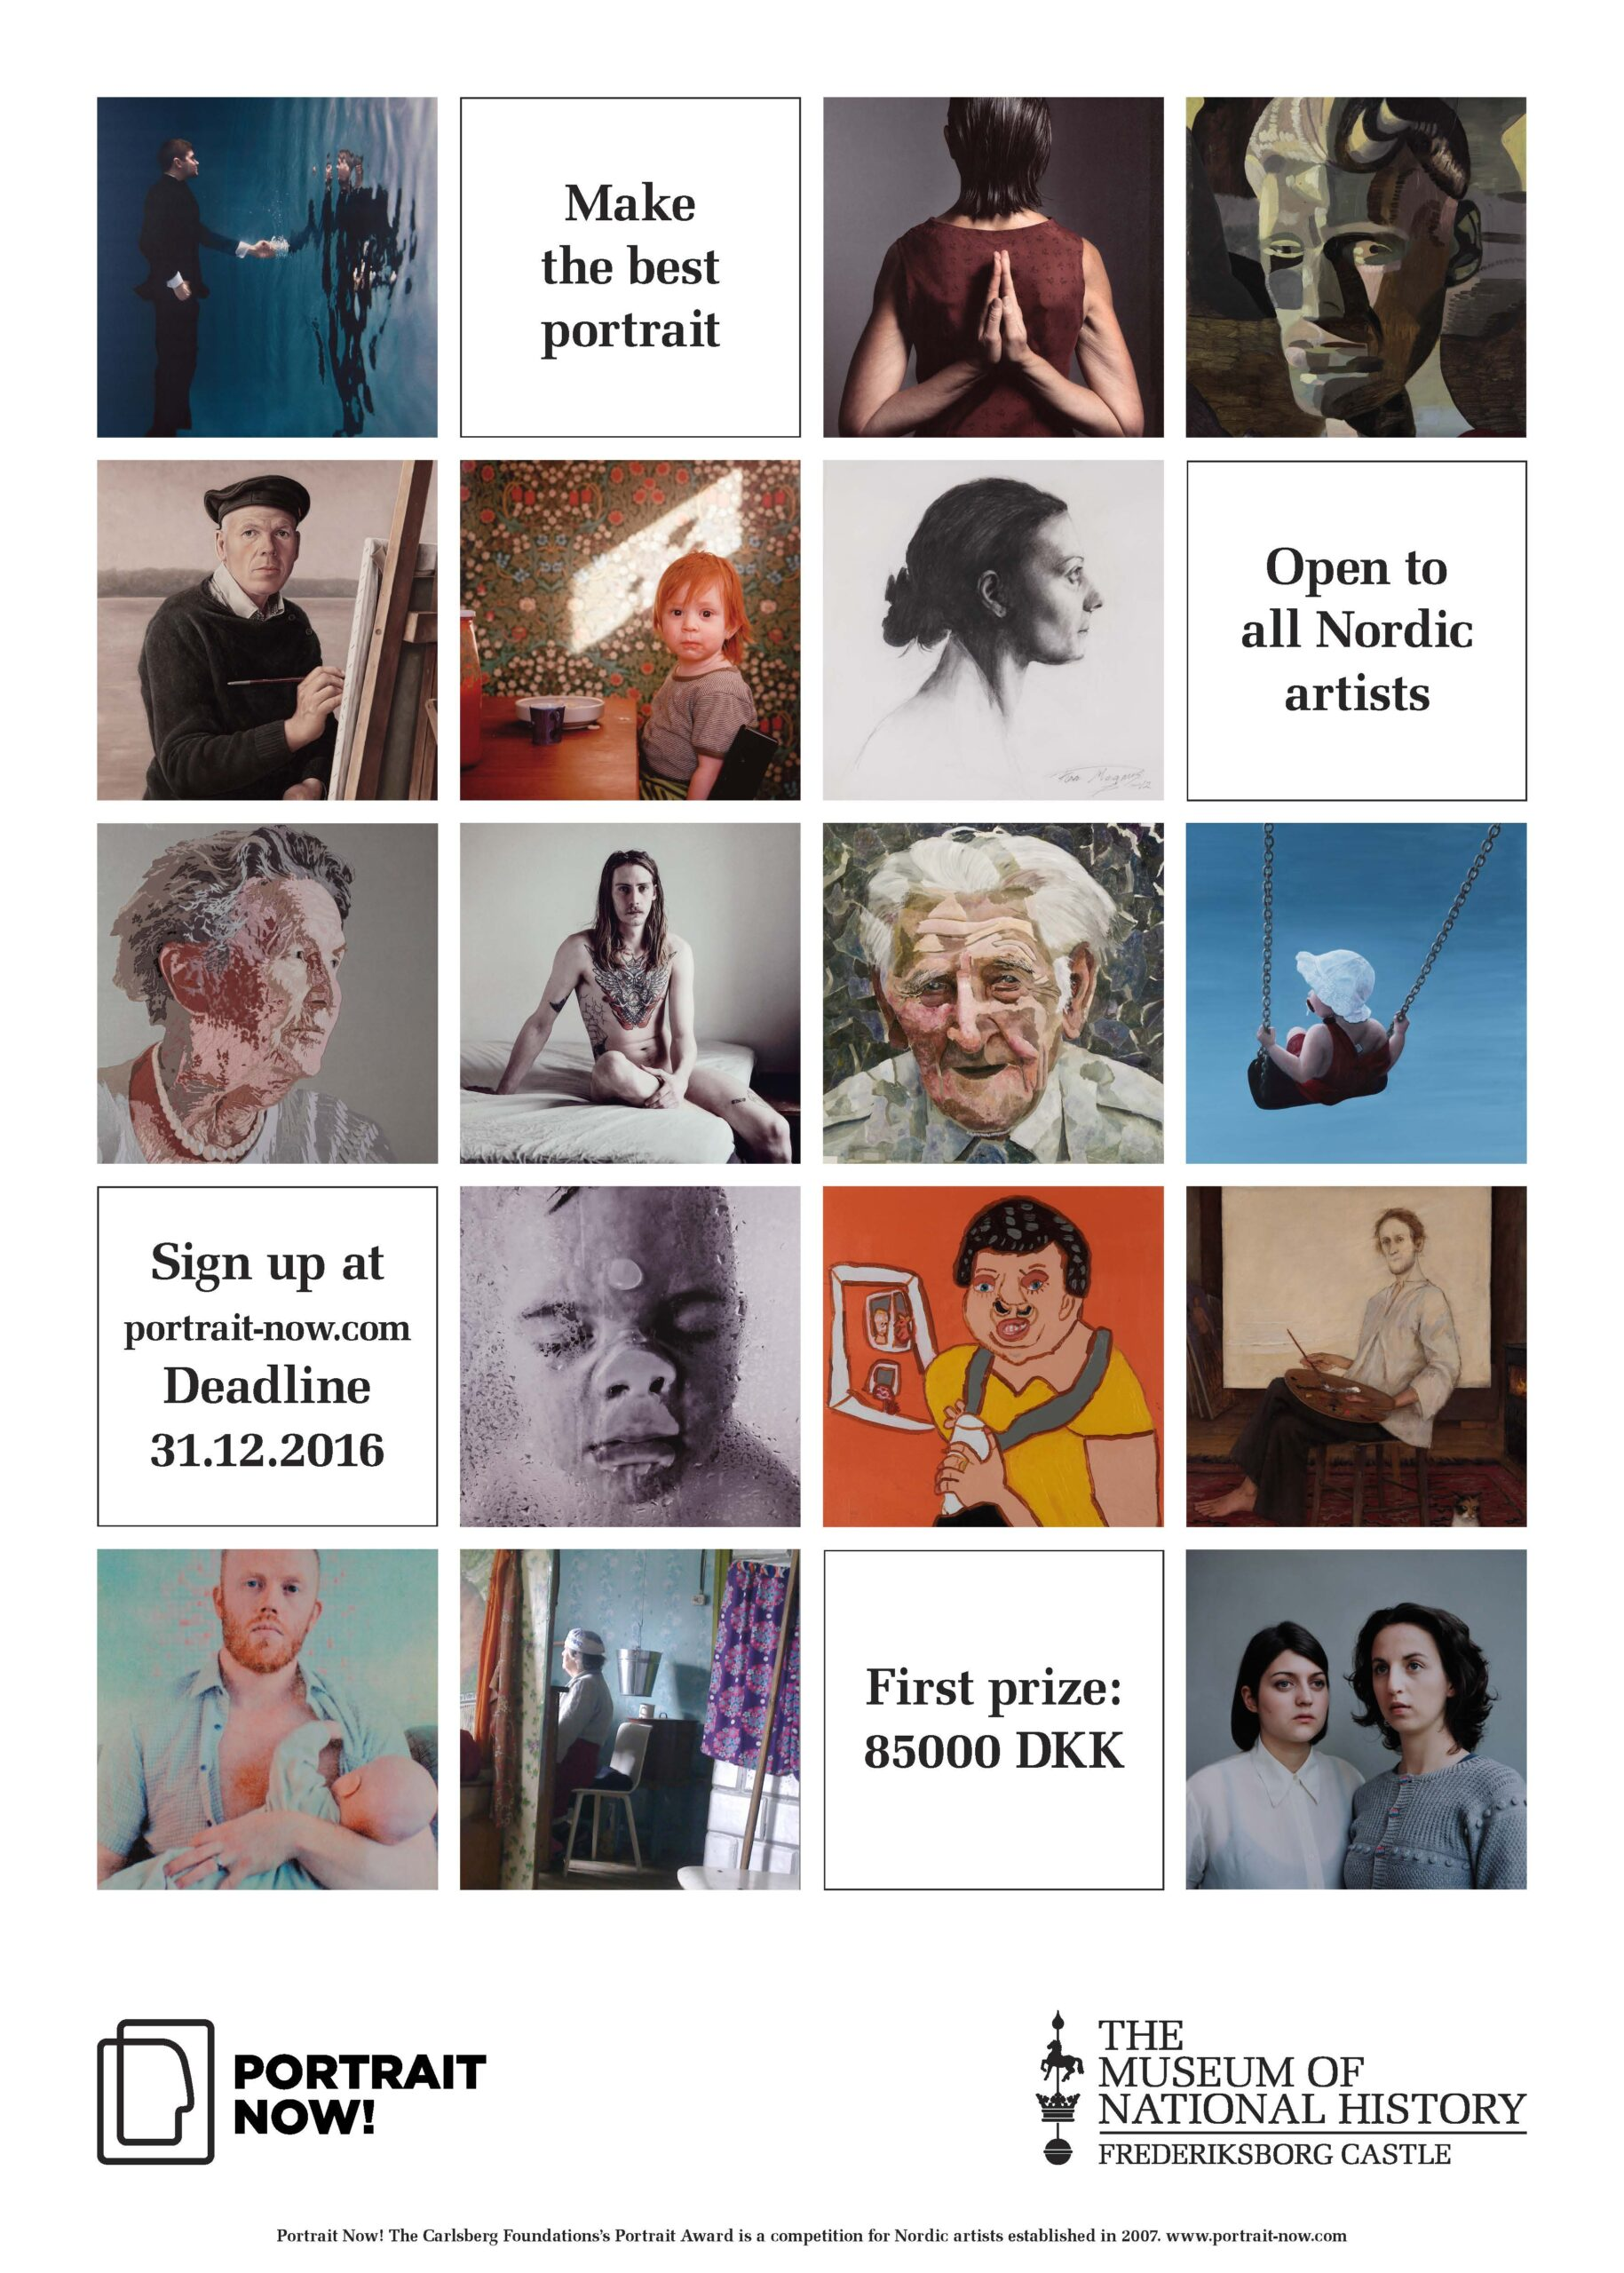 Danish museum invites Nordic artists to participate in portrait competition